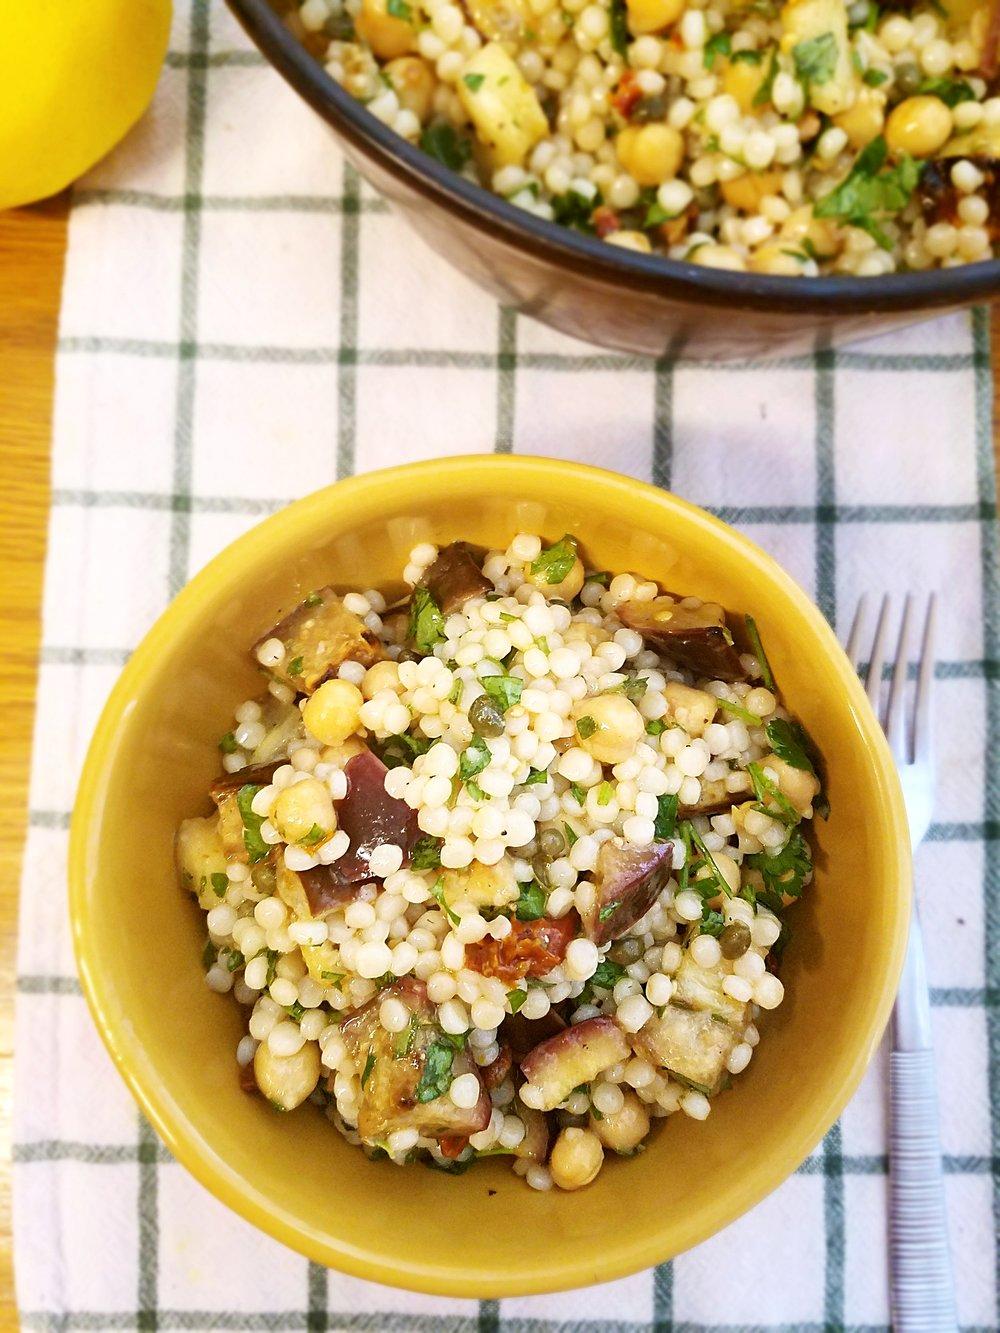 Mediterranean Chickpea Eggplant Salad